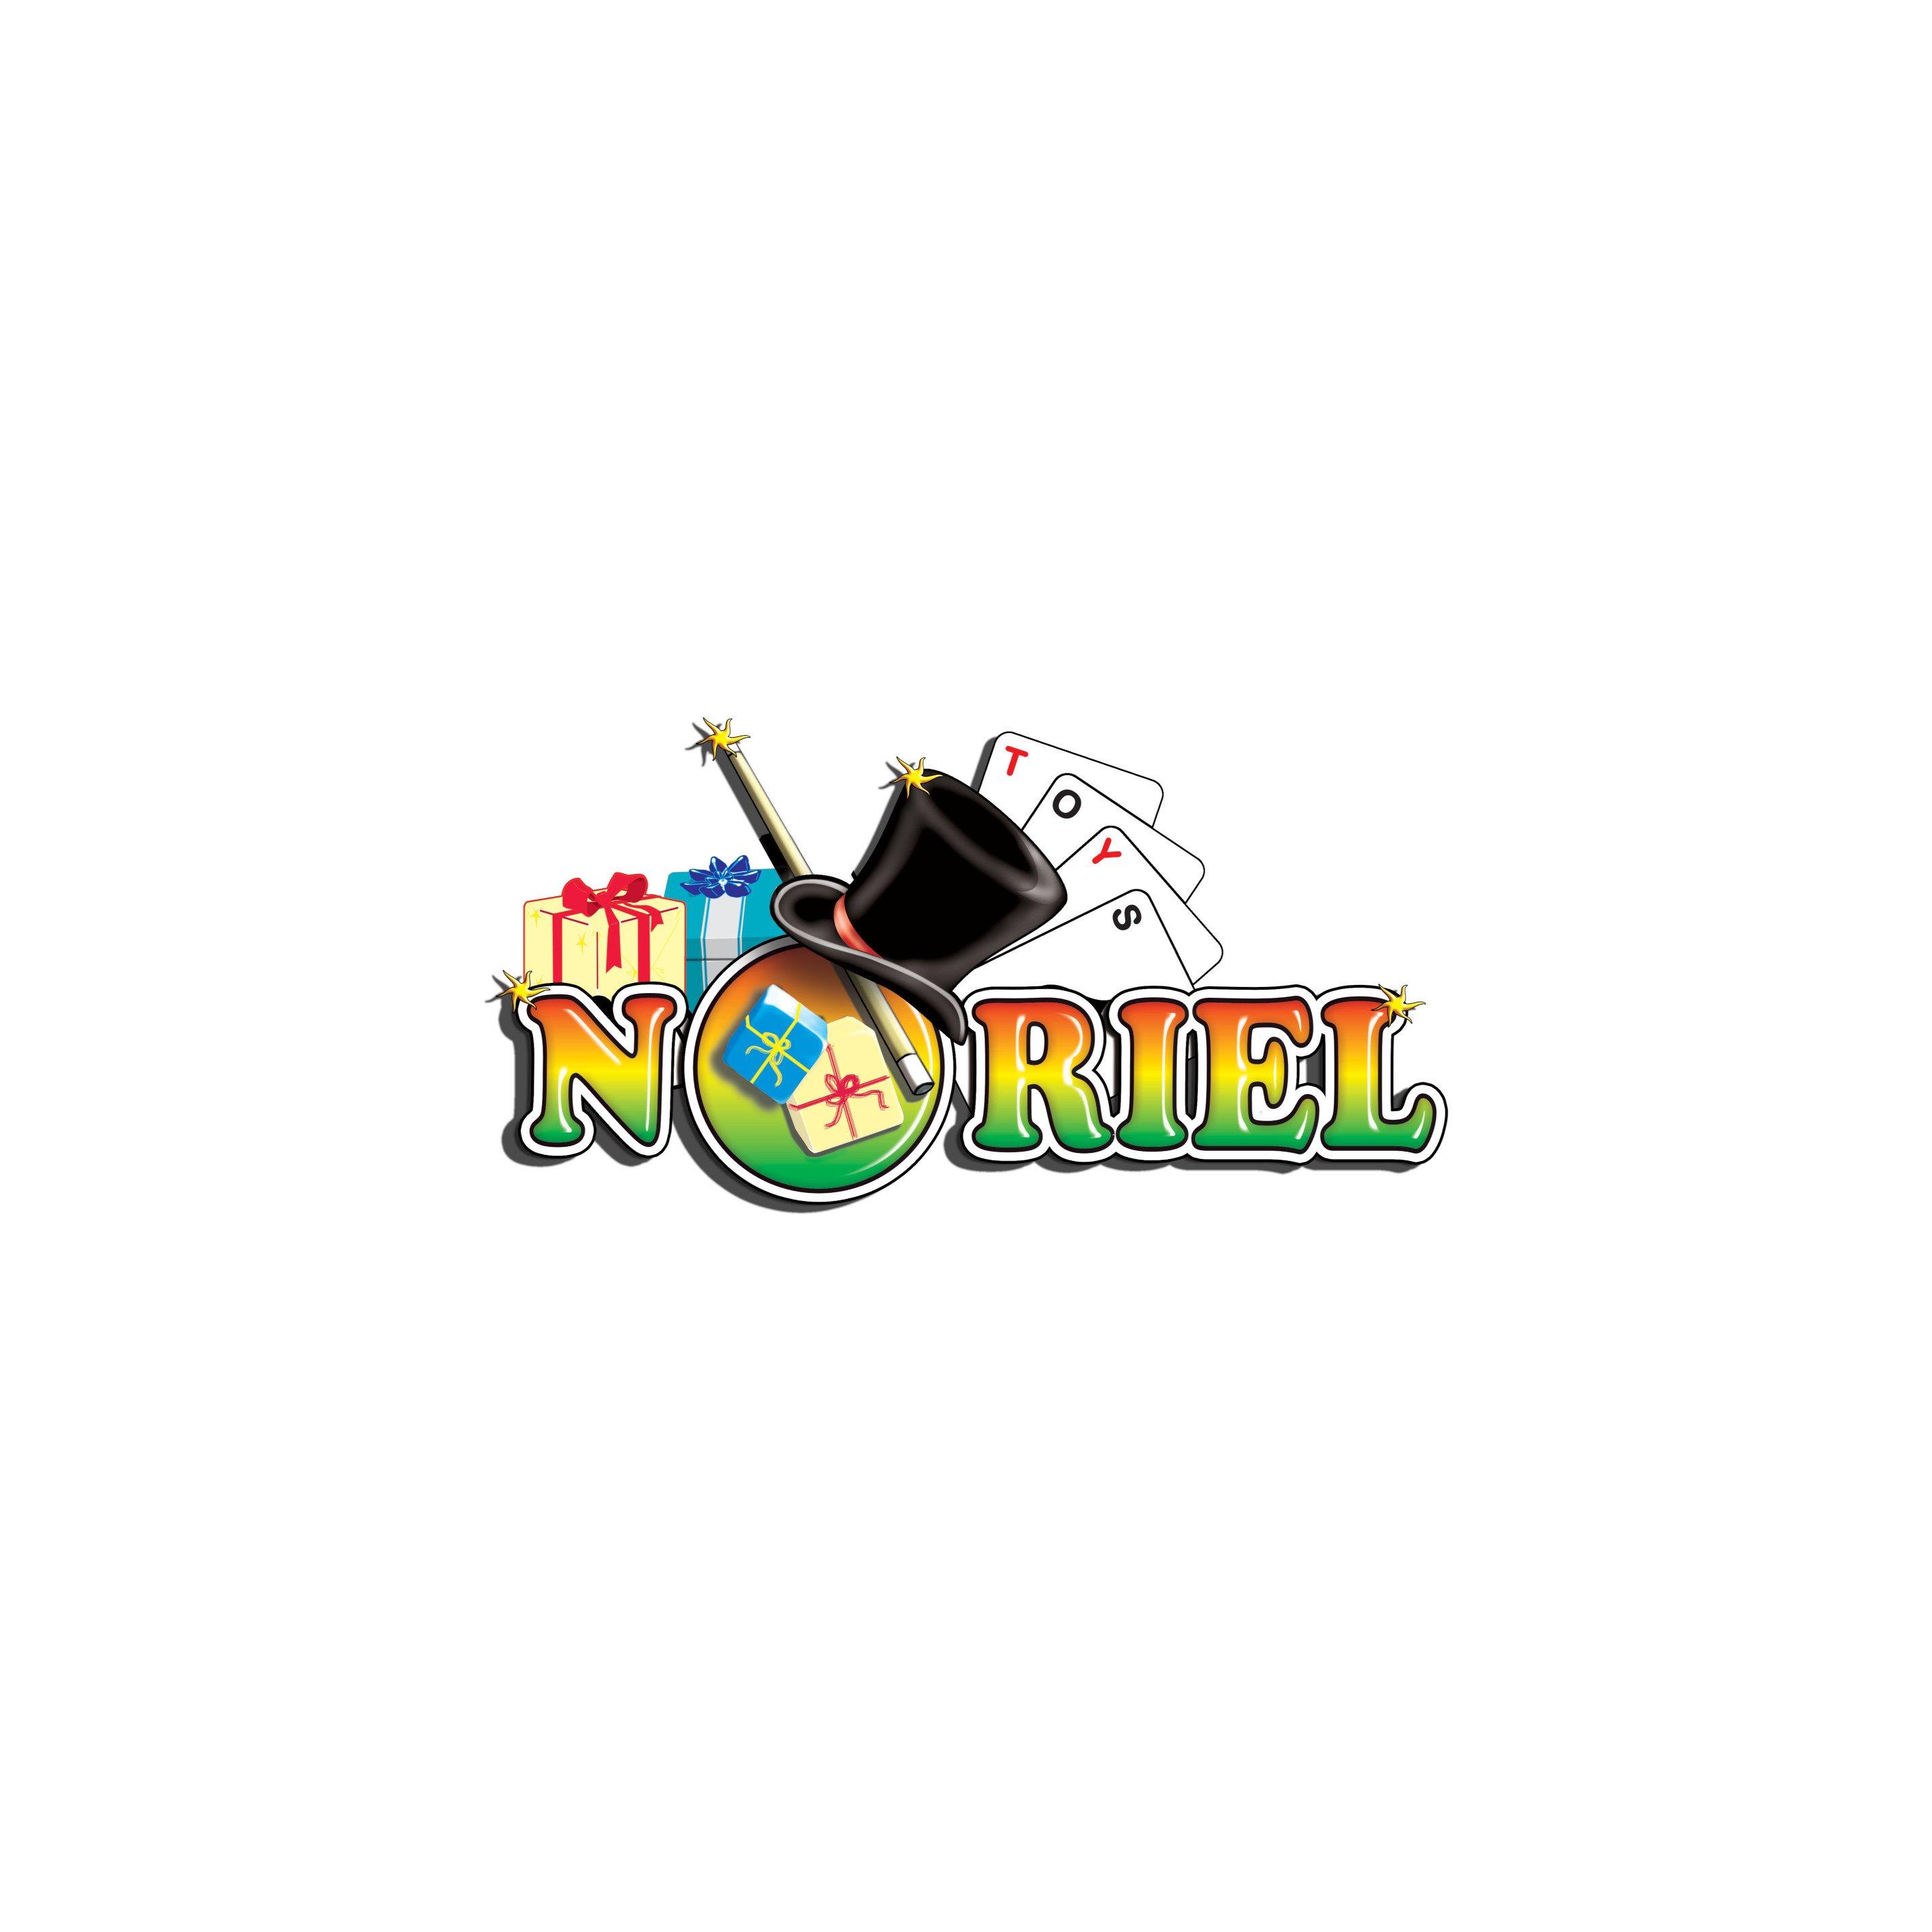 Mickey Mouse - Pistol baloane de sapun